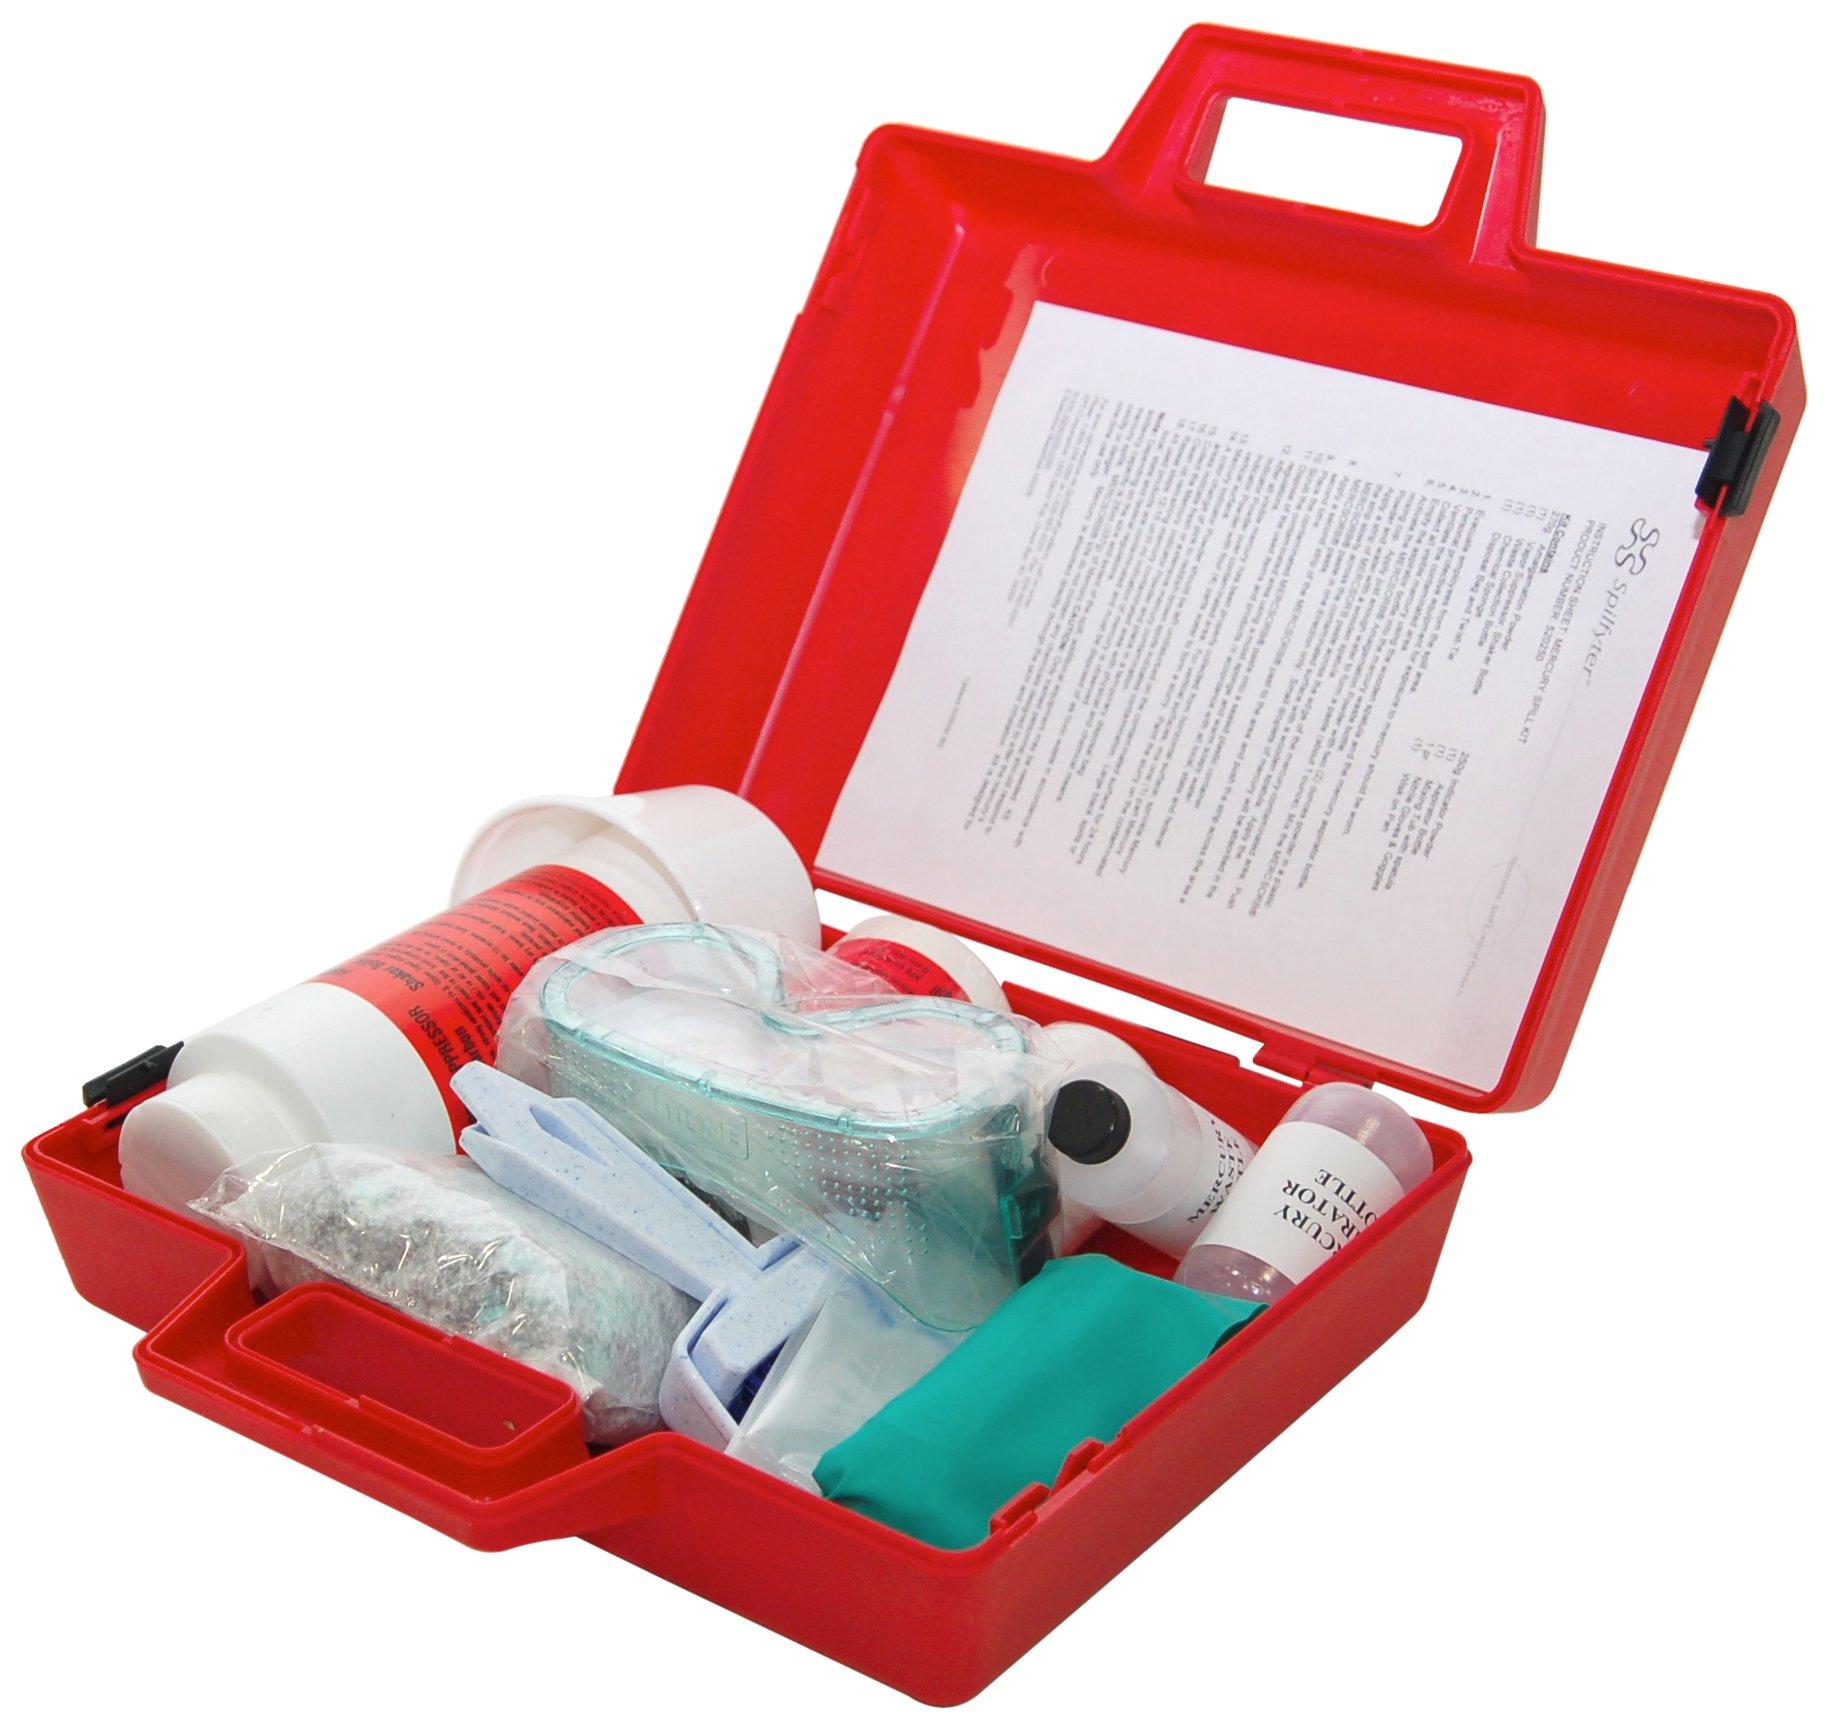 Spilfyter 520250 Specialty Spill Control Standard Mercury Spill Kit